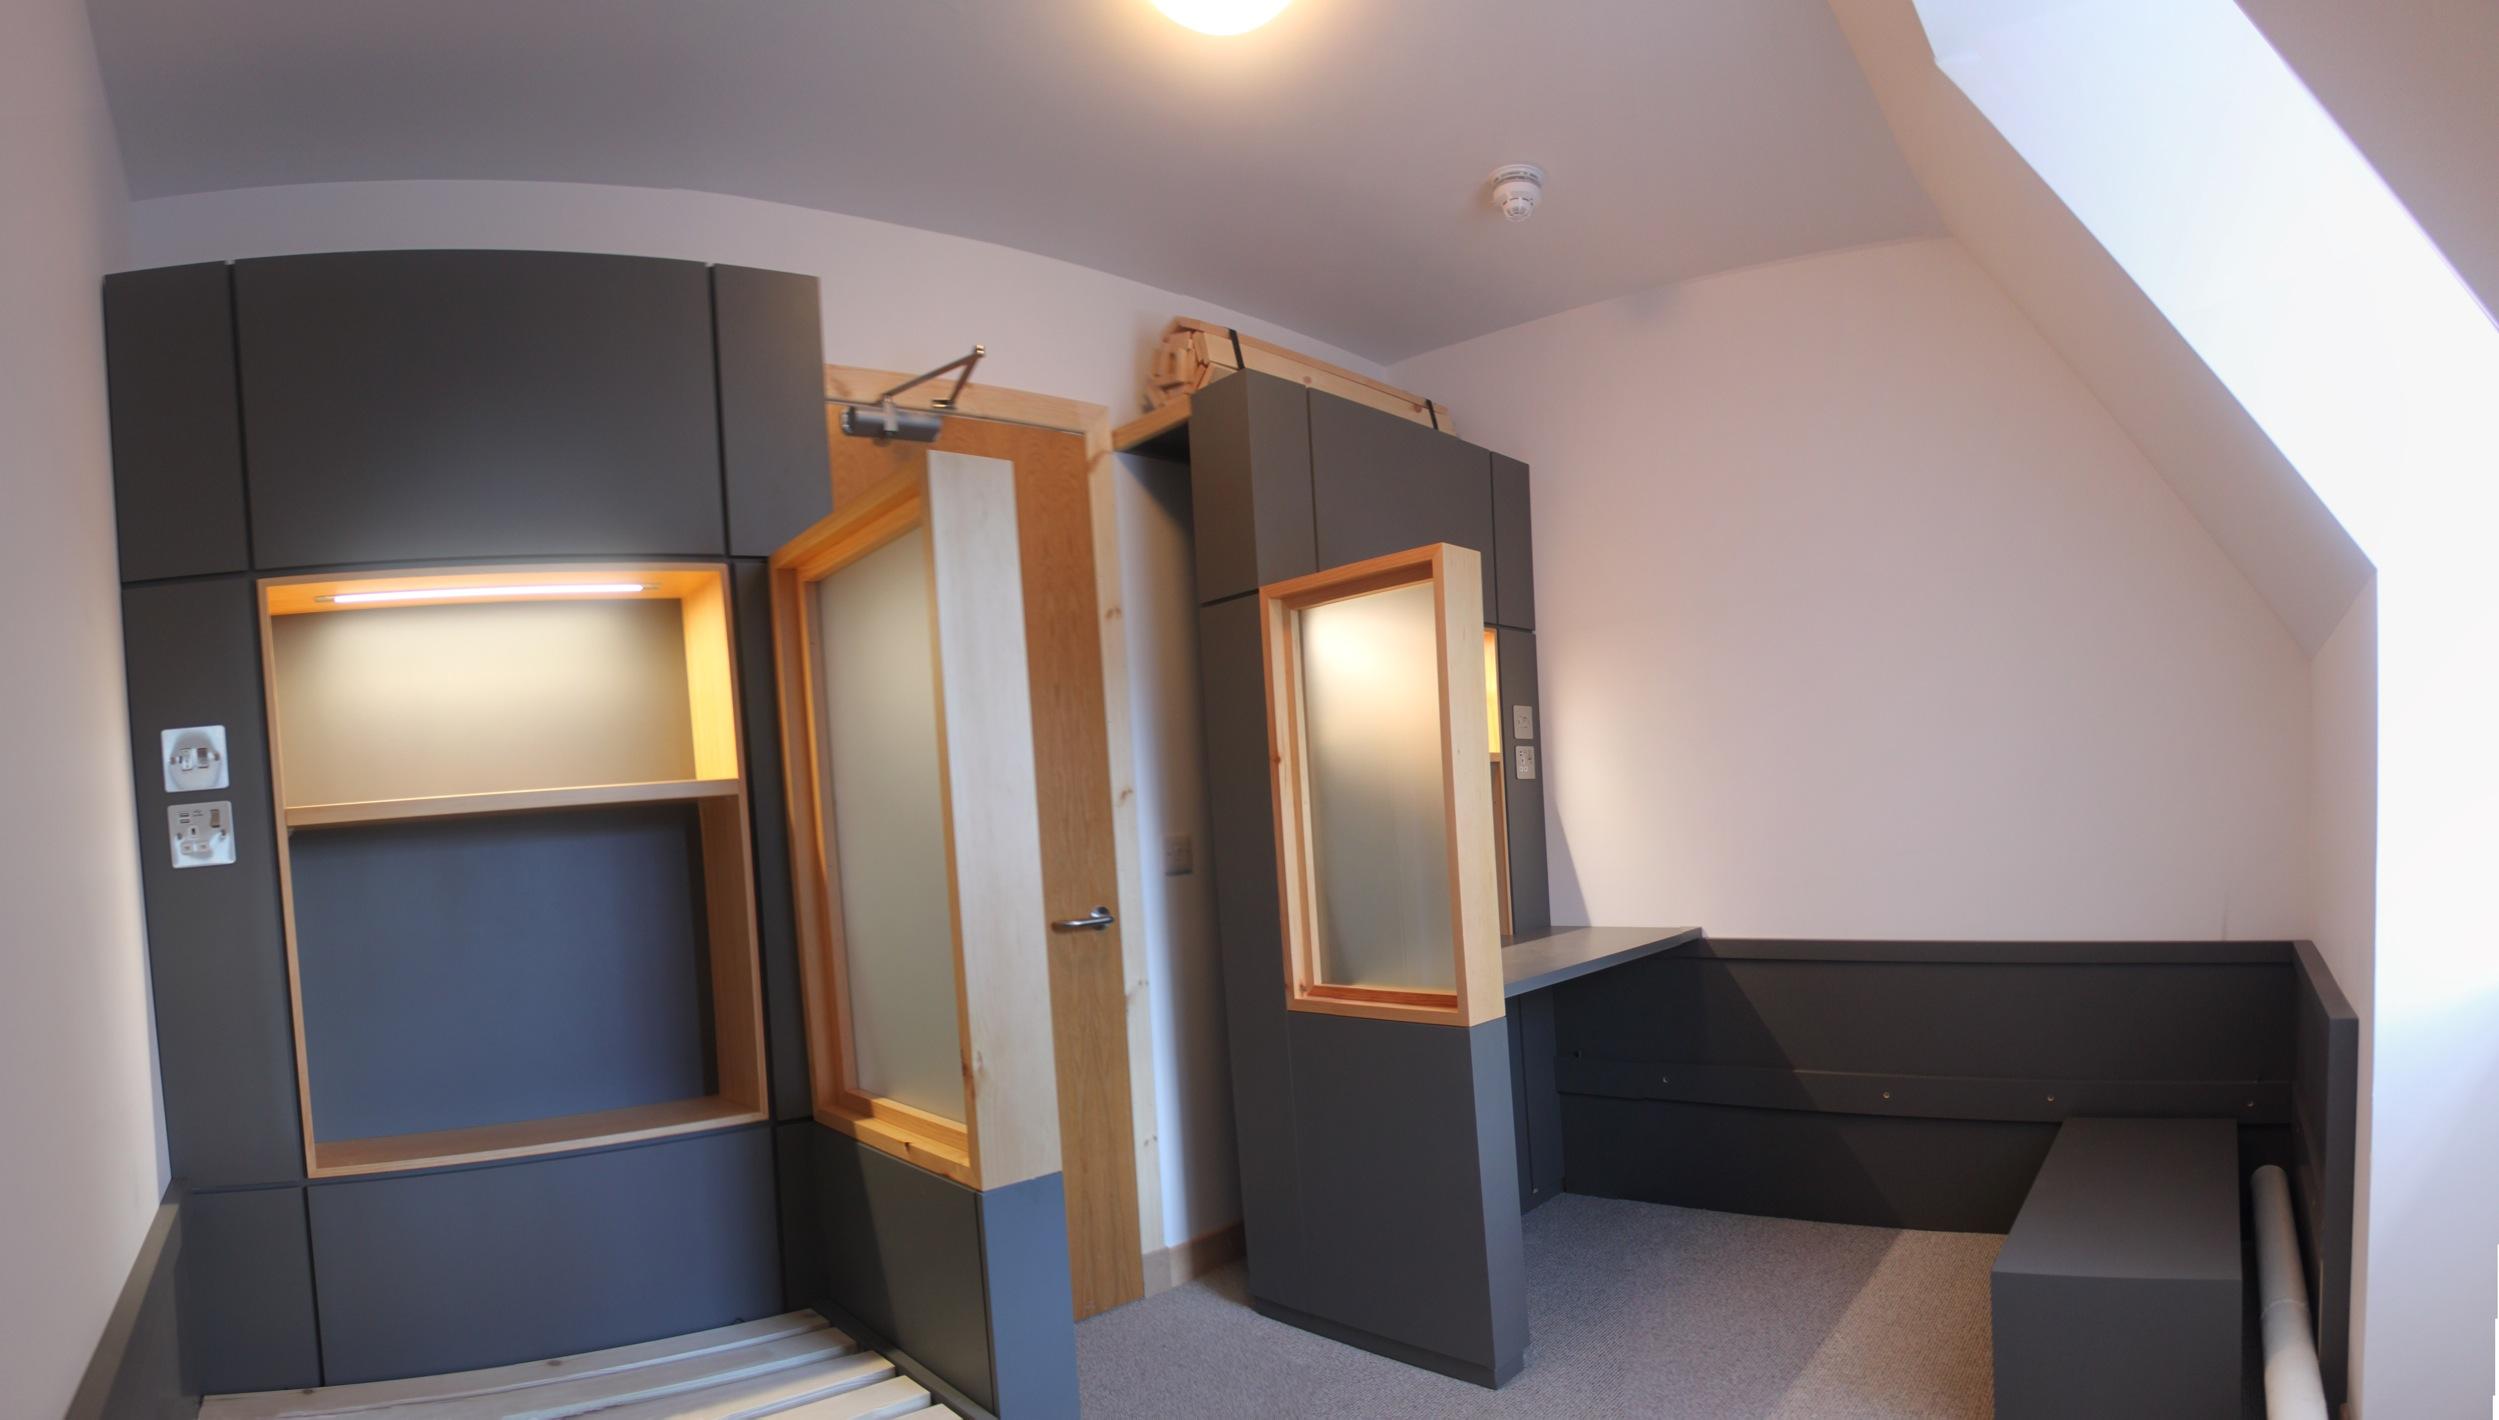 118PB Prototype bedroom 2.jpg